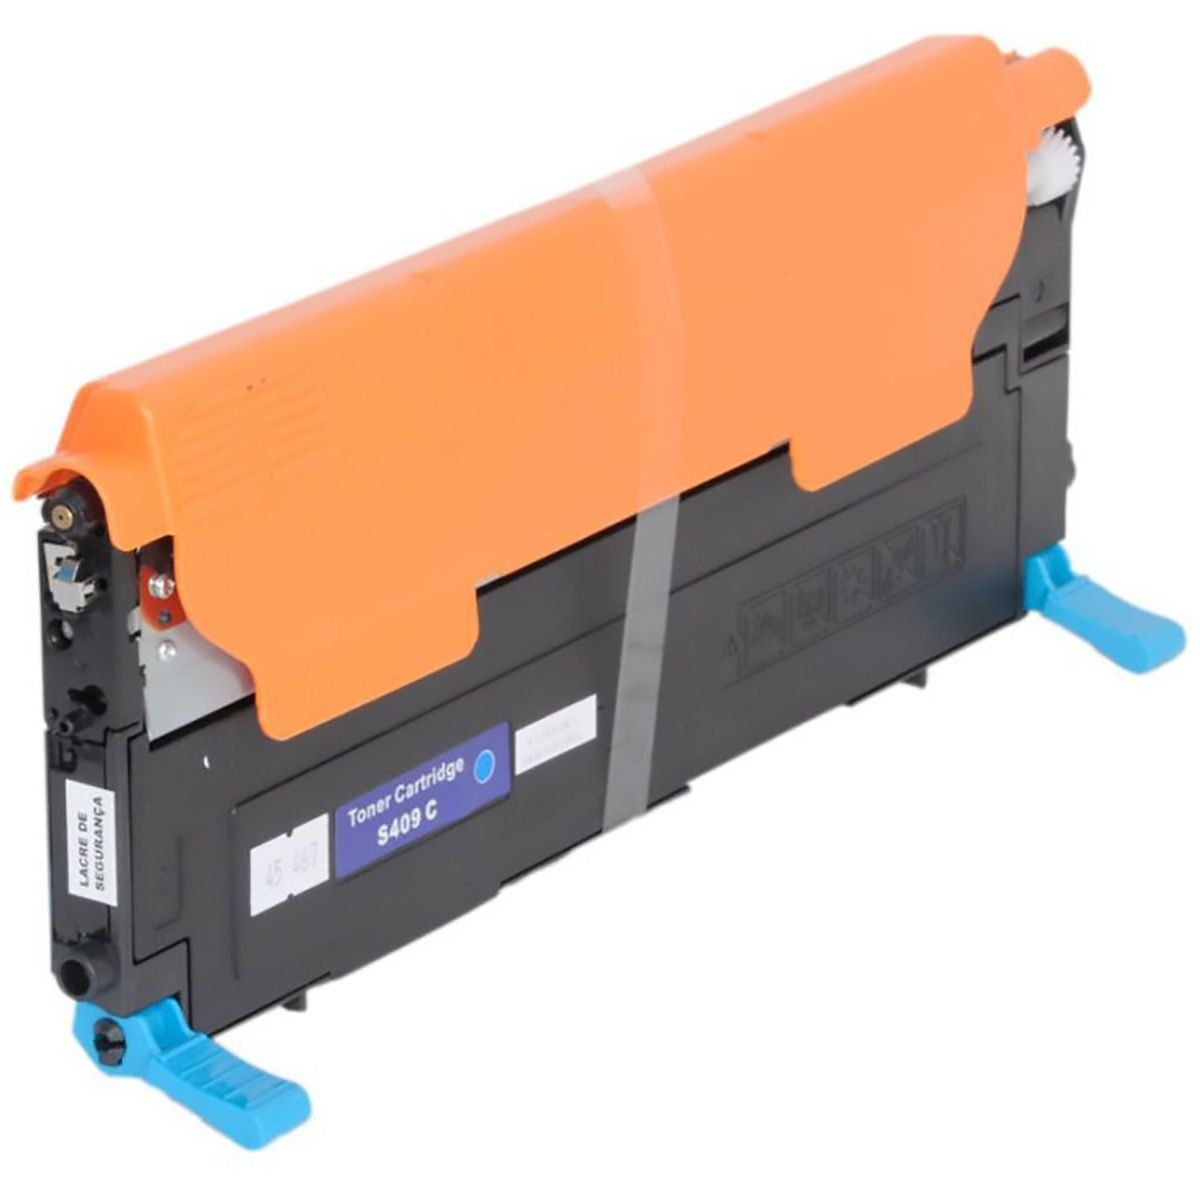 Compatível: Toner C409S CLT-409 para Samsung CLP315 CLP310 CLX3170 CLX3175 CLX3175fw CLP310n CLP315w / Ciano / 1.000